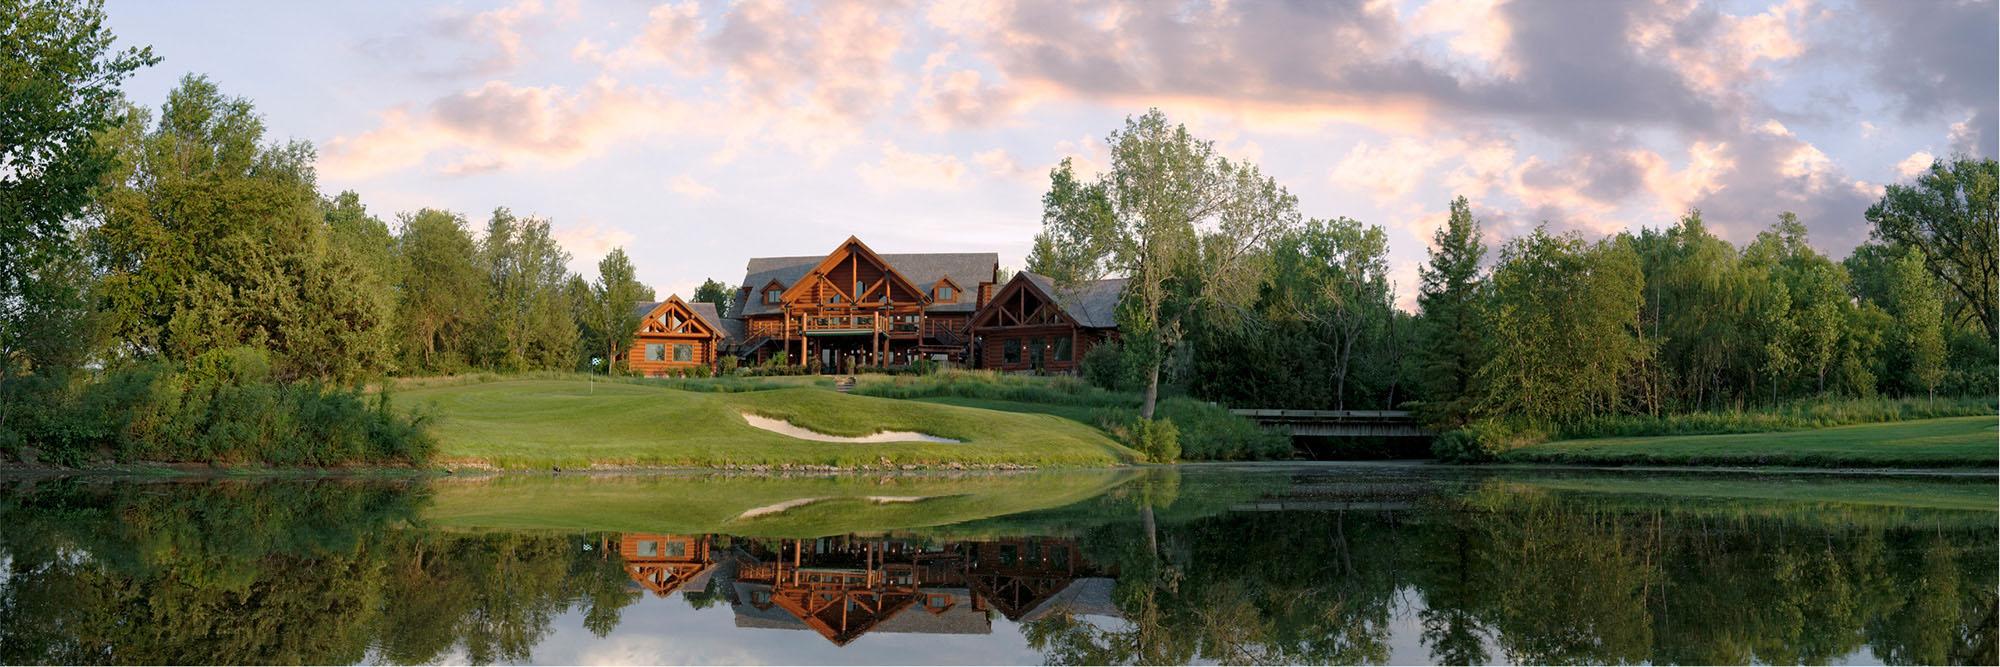 Golf Course Image - Flint Hills National No. 18